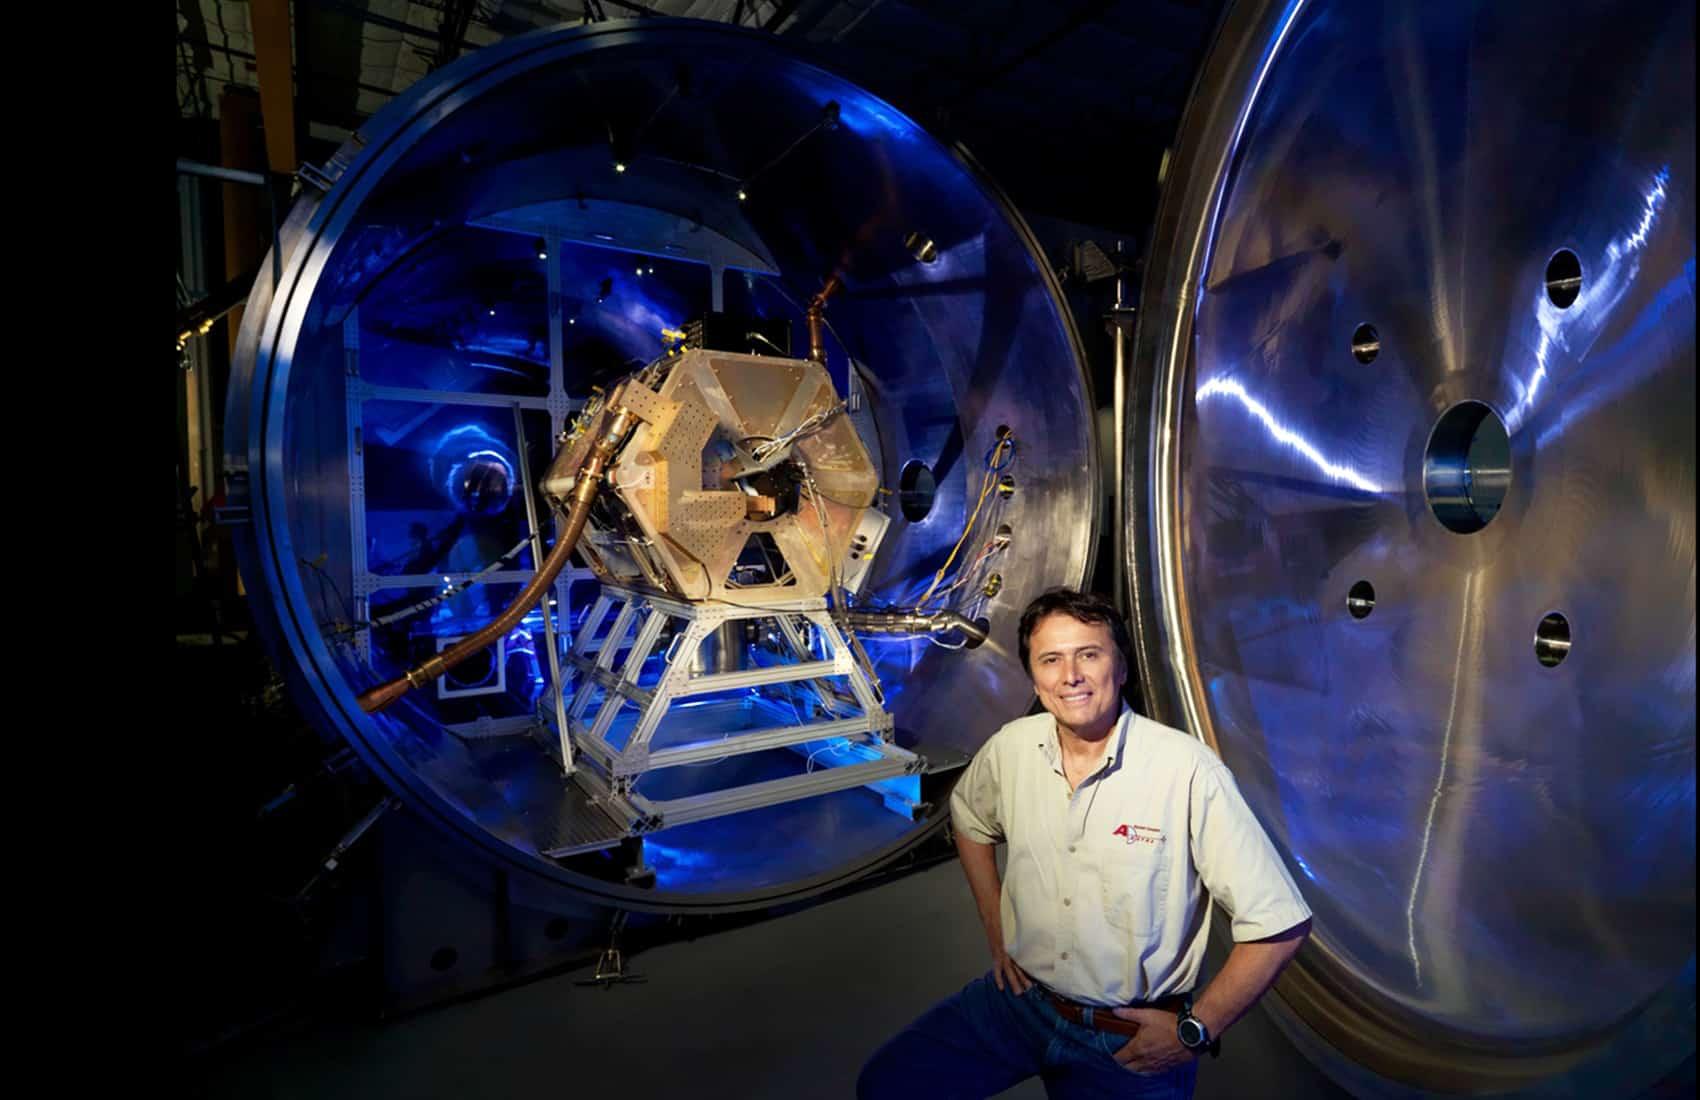 VASIMR plasma engine at Ad Astra Rocket